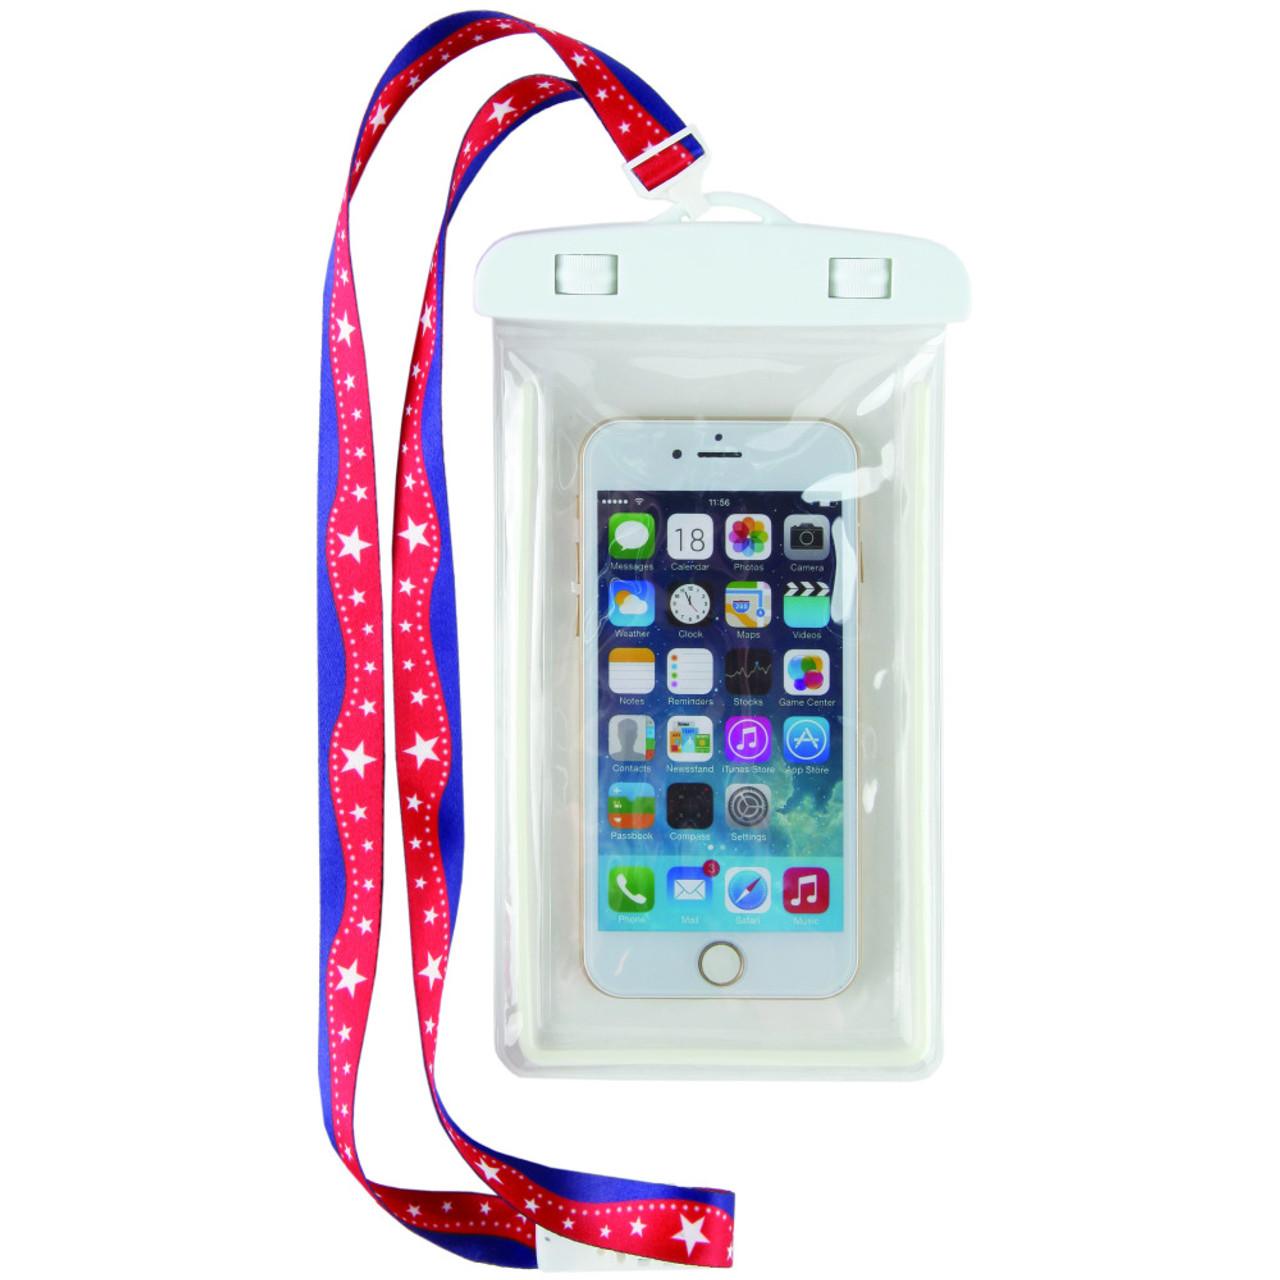 buy online 9b627 4884f Super Stars Waterproof Phone Case Lanyard